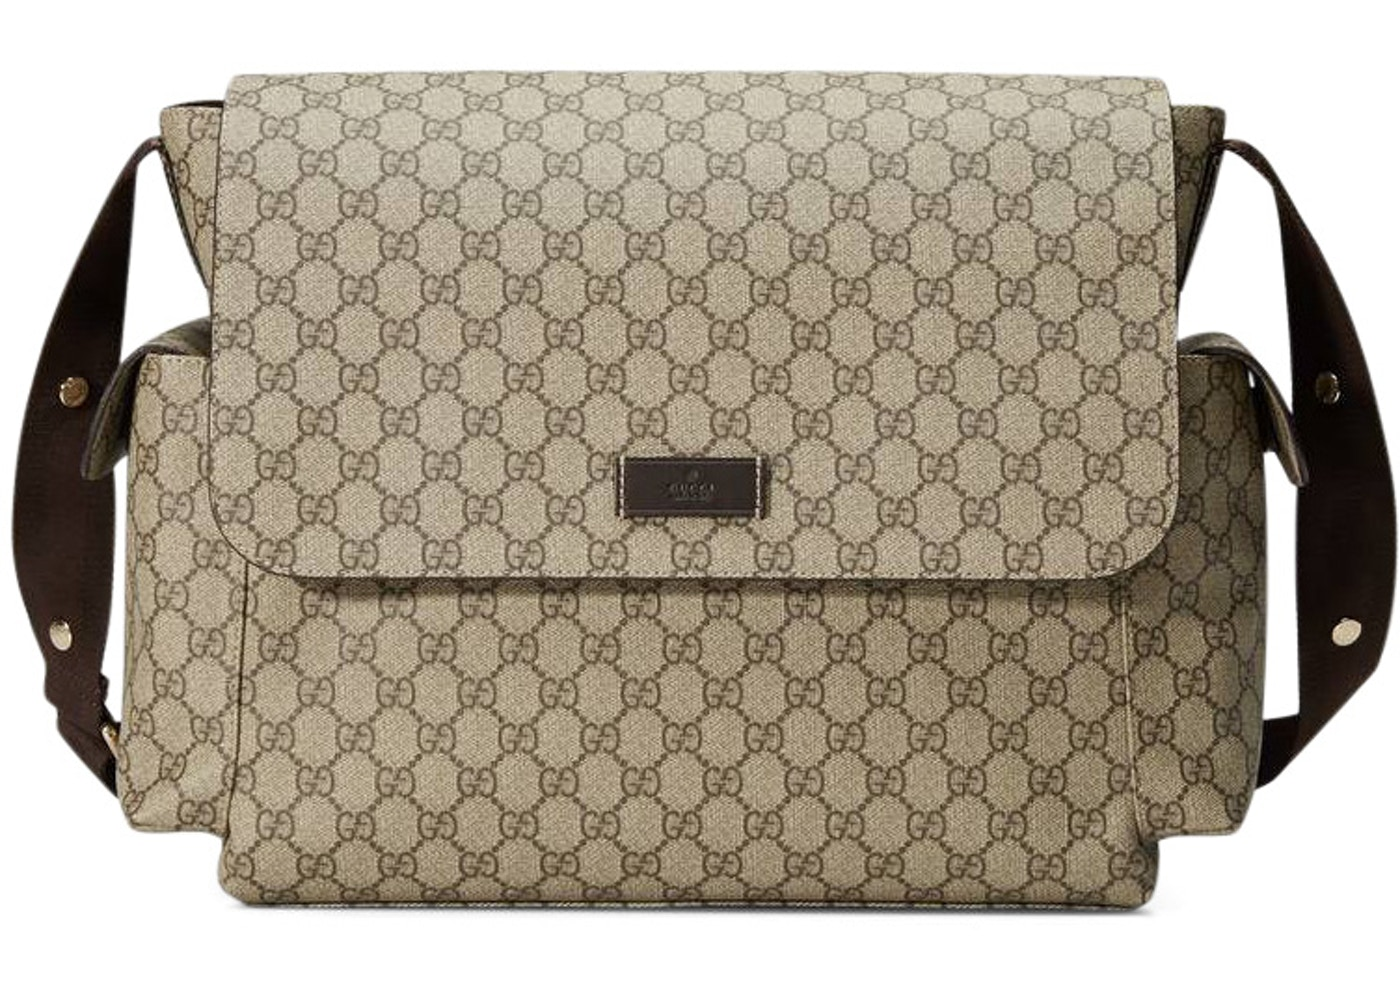 Gucci Diaper Bag Crossbody Gg Supreme Brown